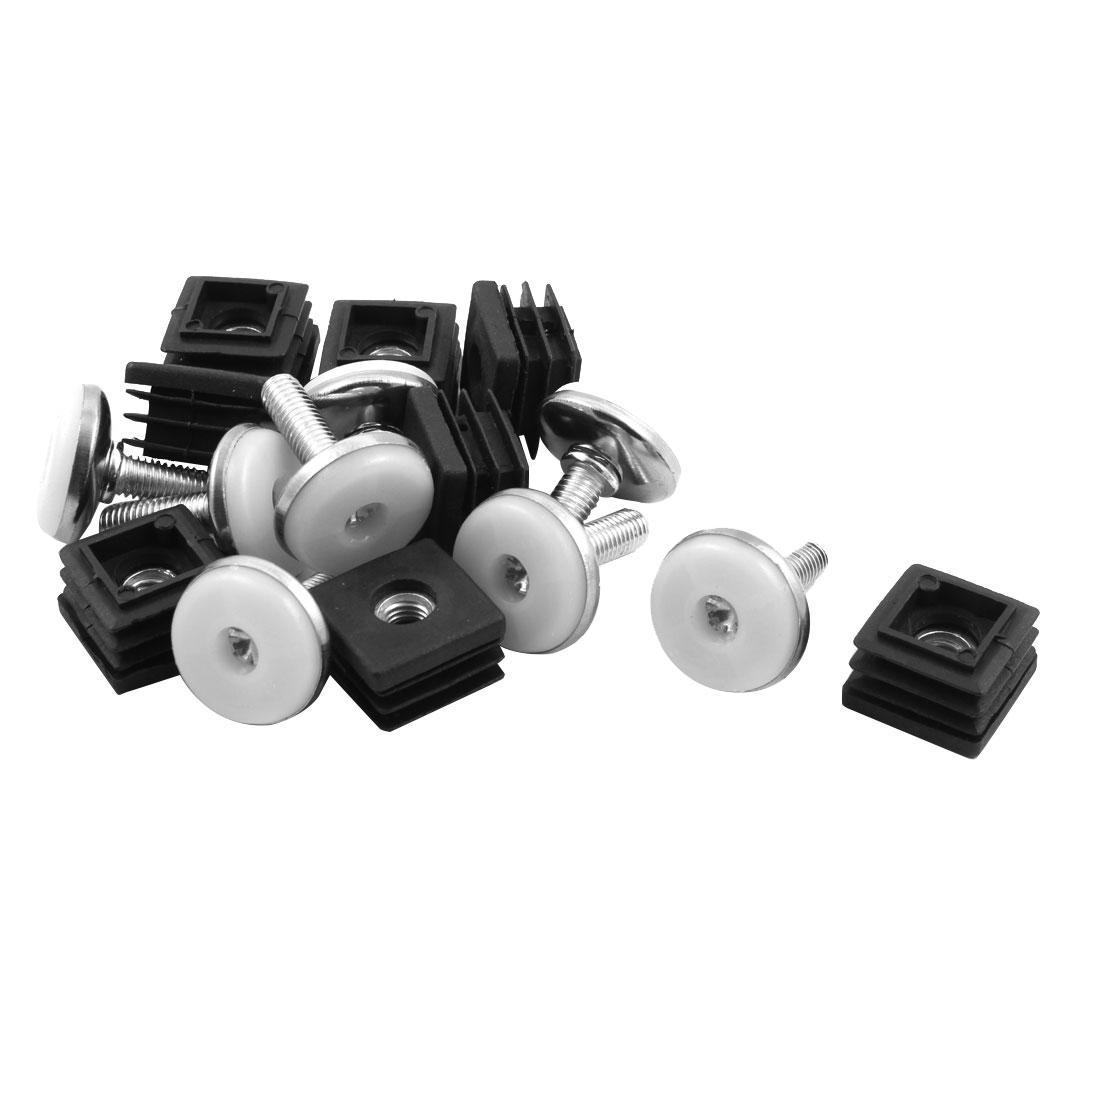 Furniture Plastic Round Base Leveling Leg Rectangle Tube Insert 25 x 25mm 8 Sets